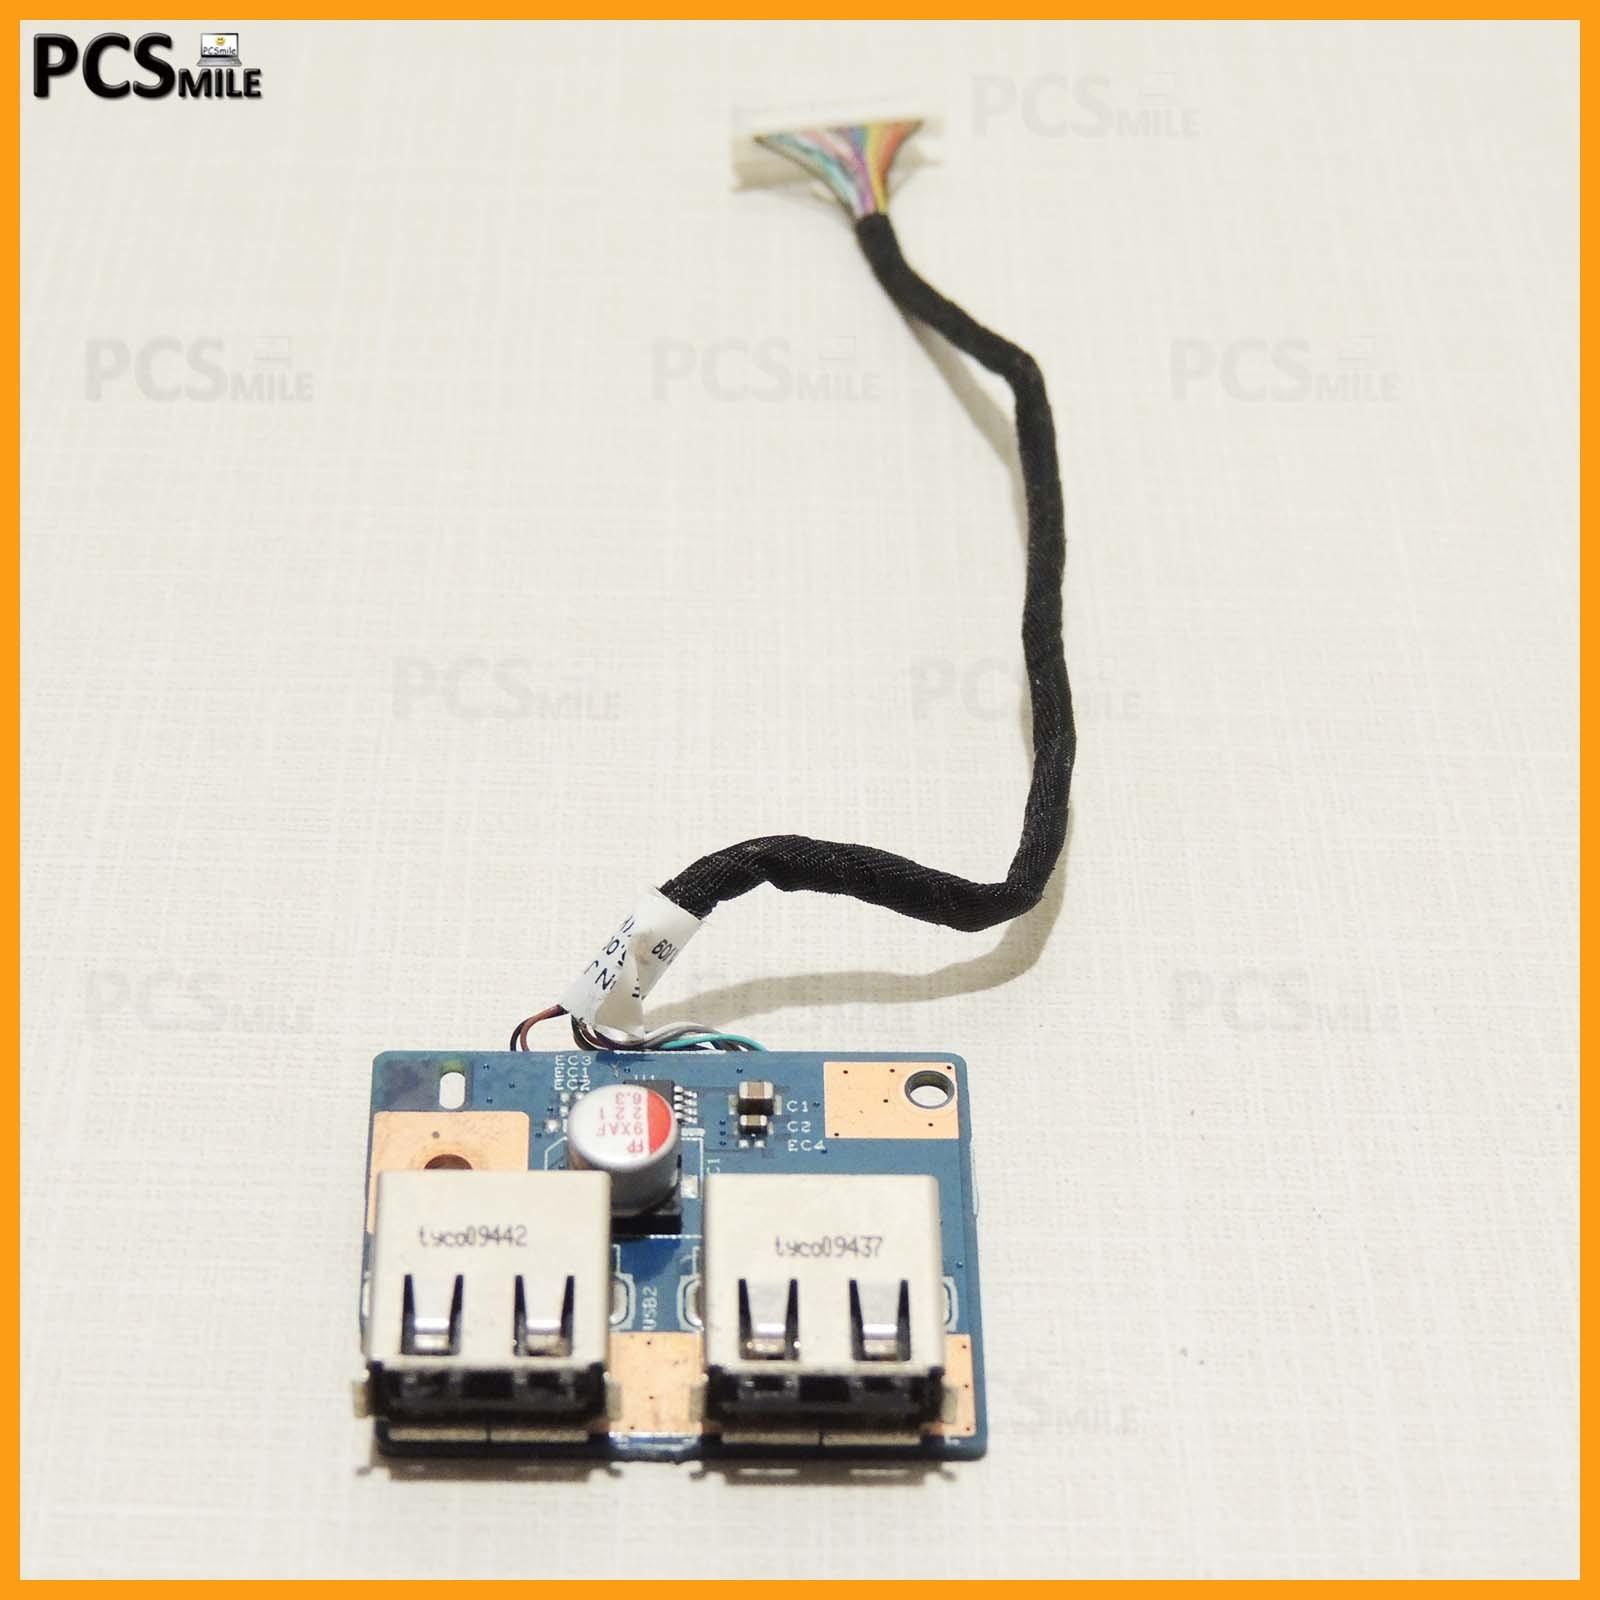 Porte USB Flat Acer Aspire 5542G/5542/5242 MS2277 48.4CG04.011 50.4CG05.011